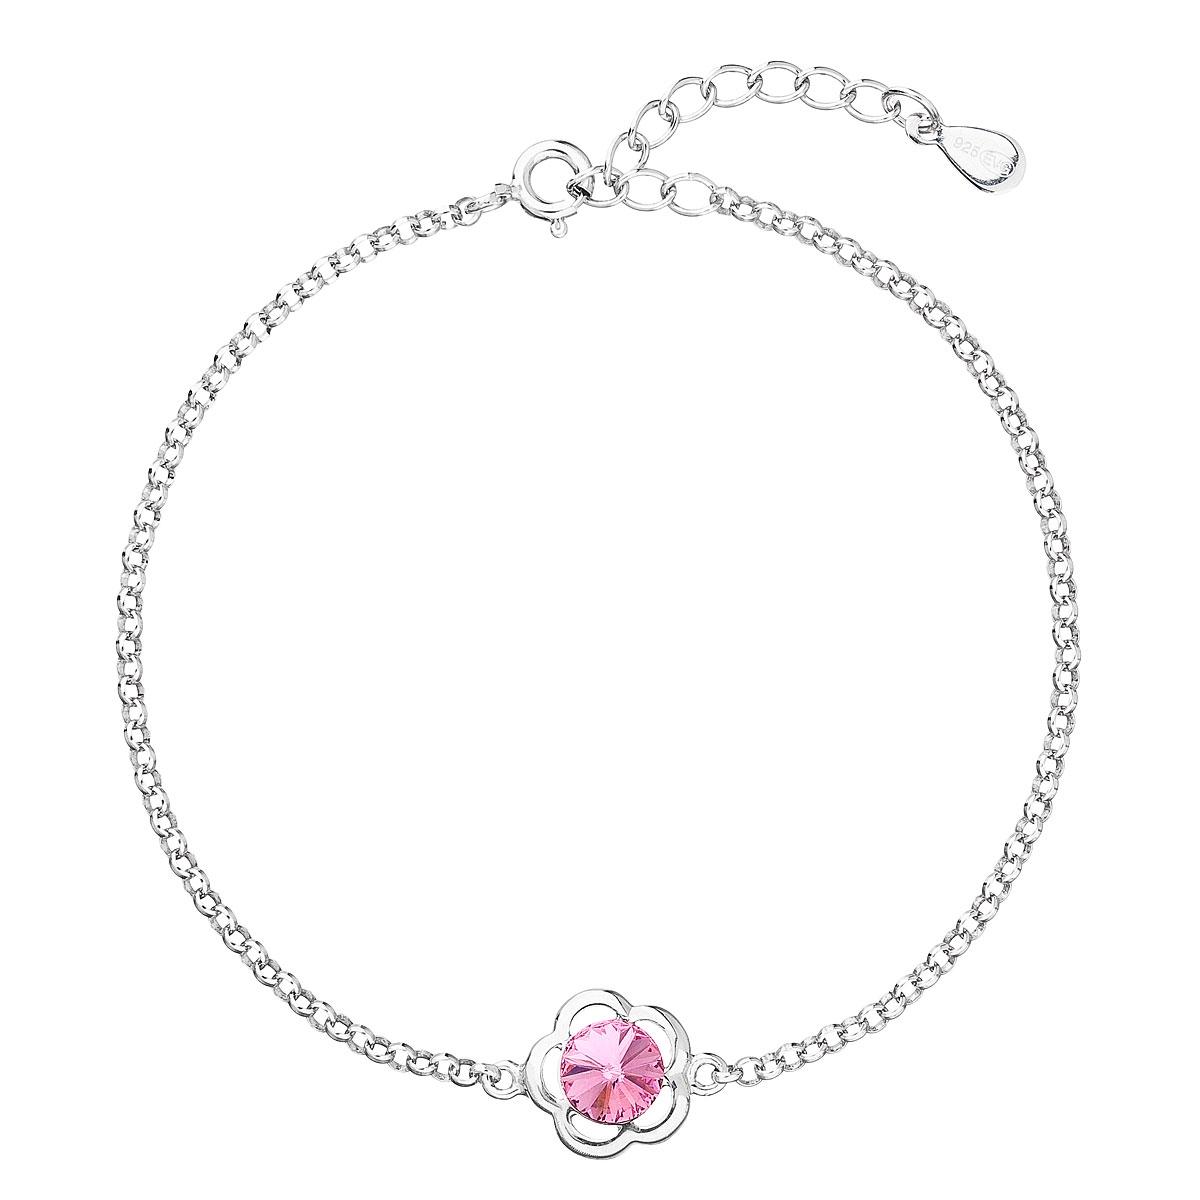 Stříbrný náramek s tyrkysovým kamenem Crystals from Swarovski® Rose EG7057-RO